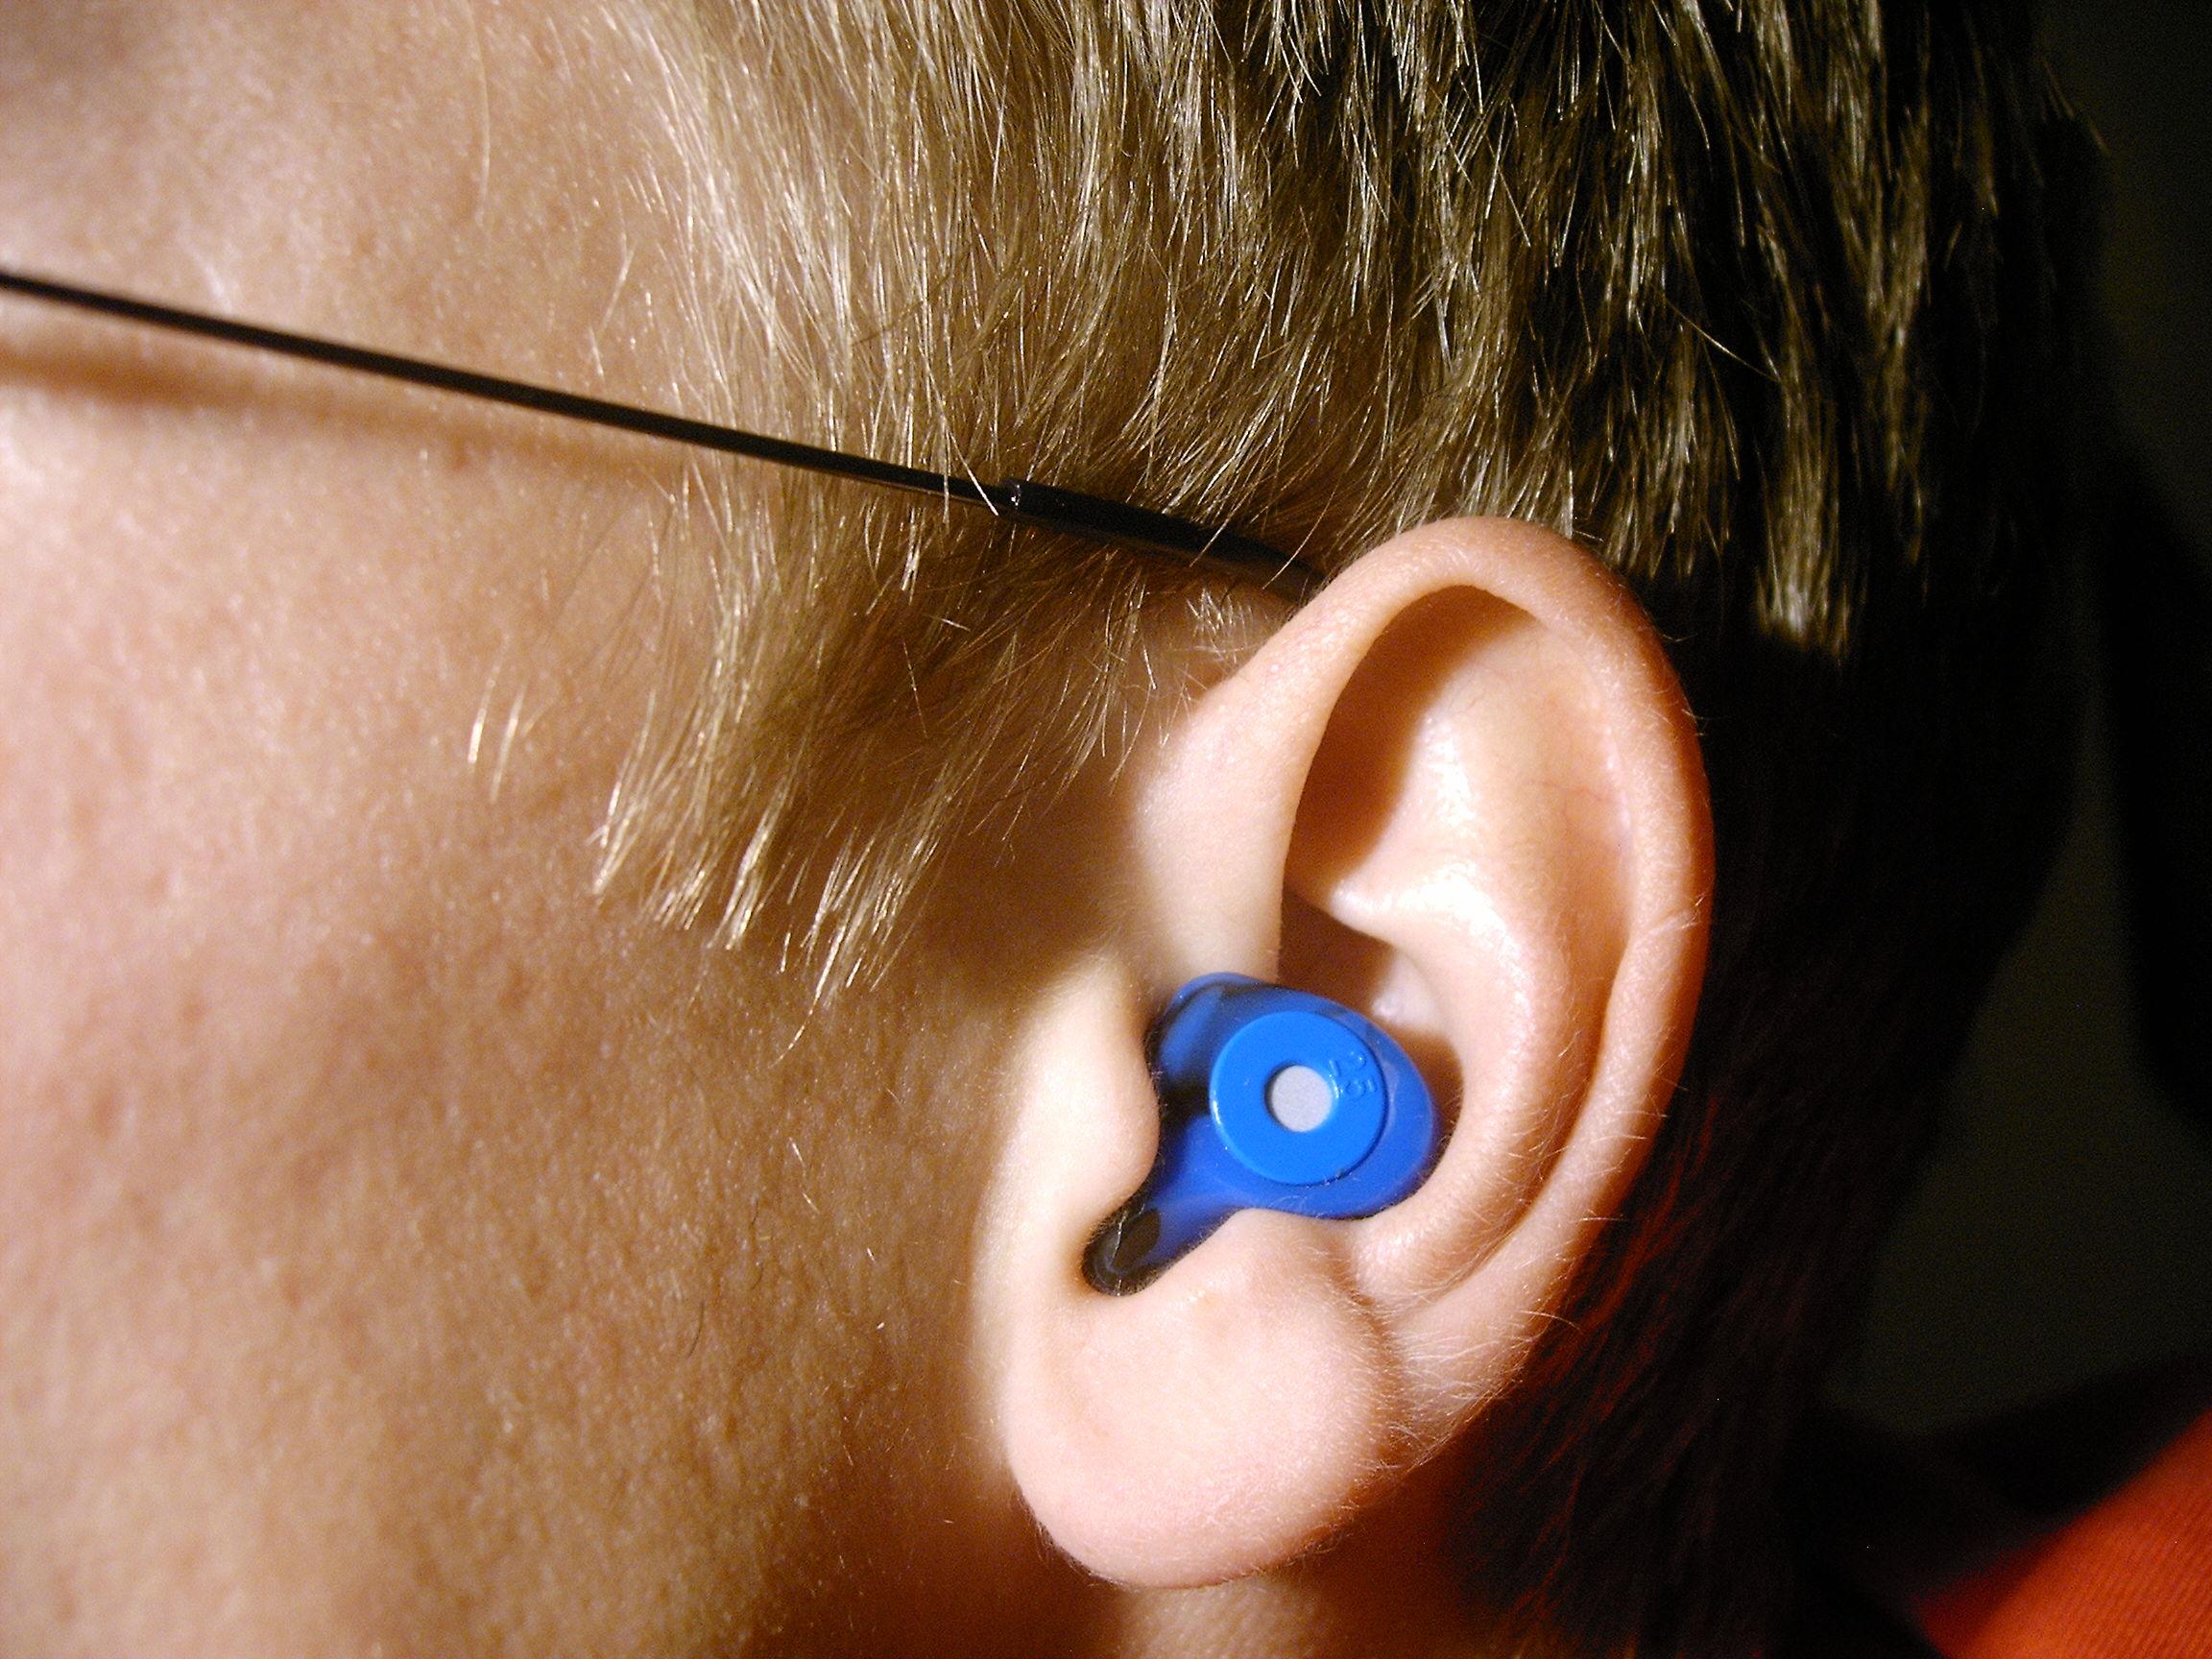 Silicone /& Foam PlugFones Guardian Series Ear Plugs with Built In Headphones